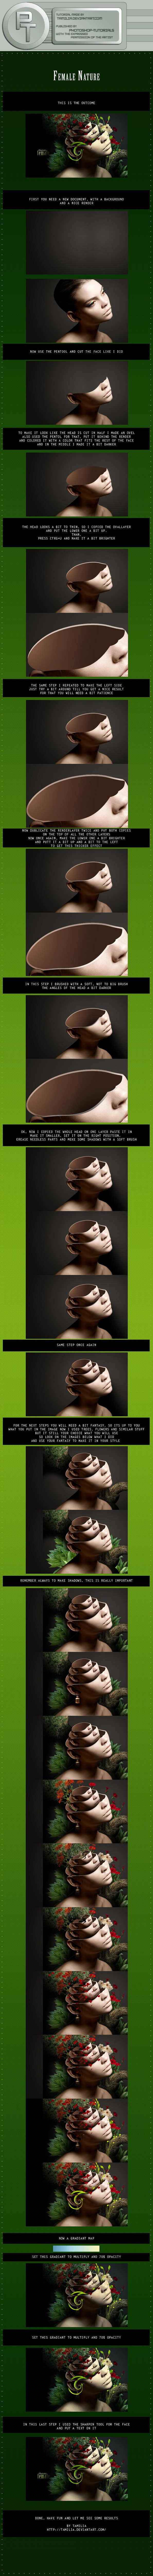 Female Nature Walkthrough -W- by photoshop-tutorials